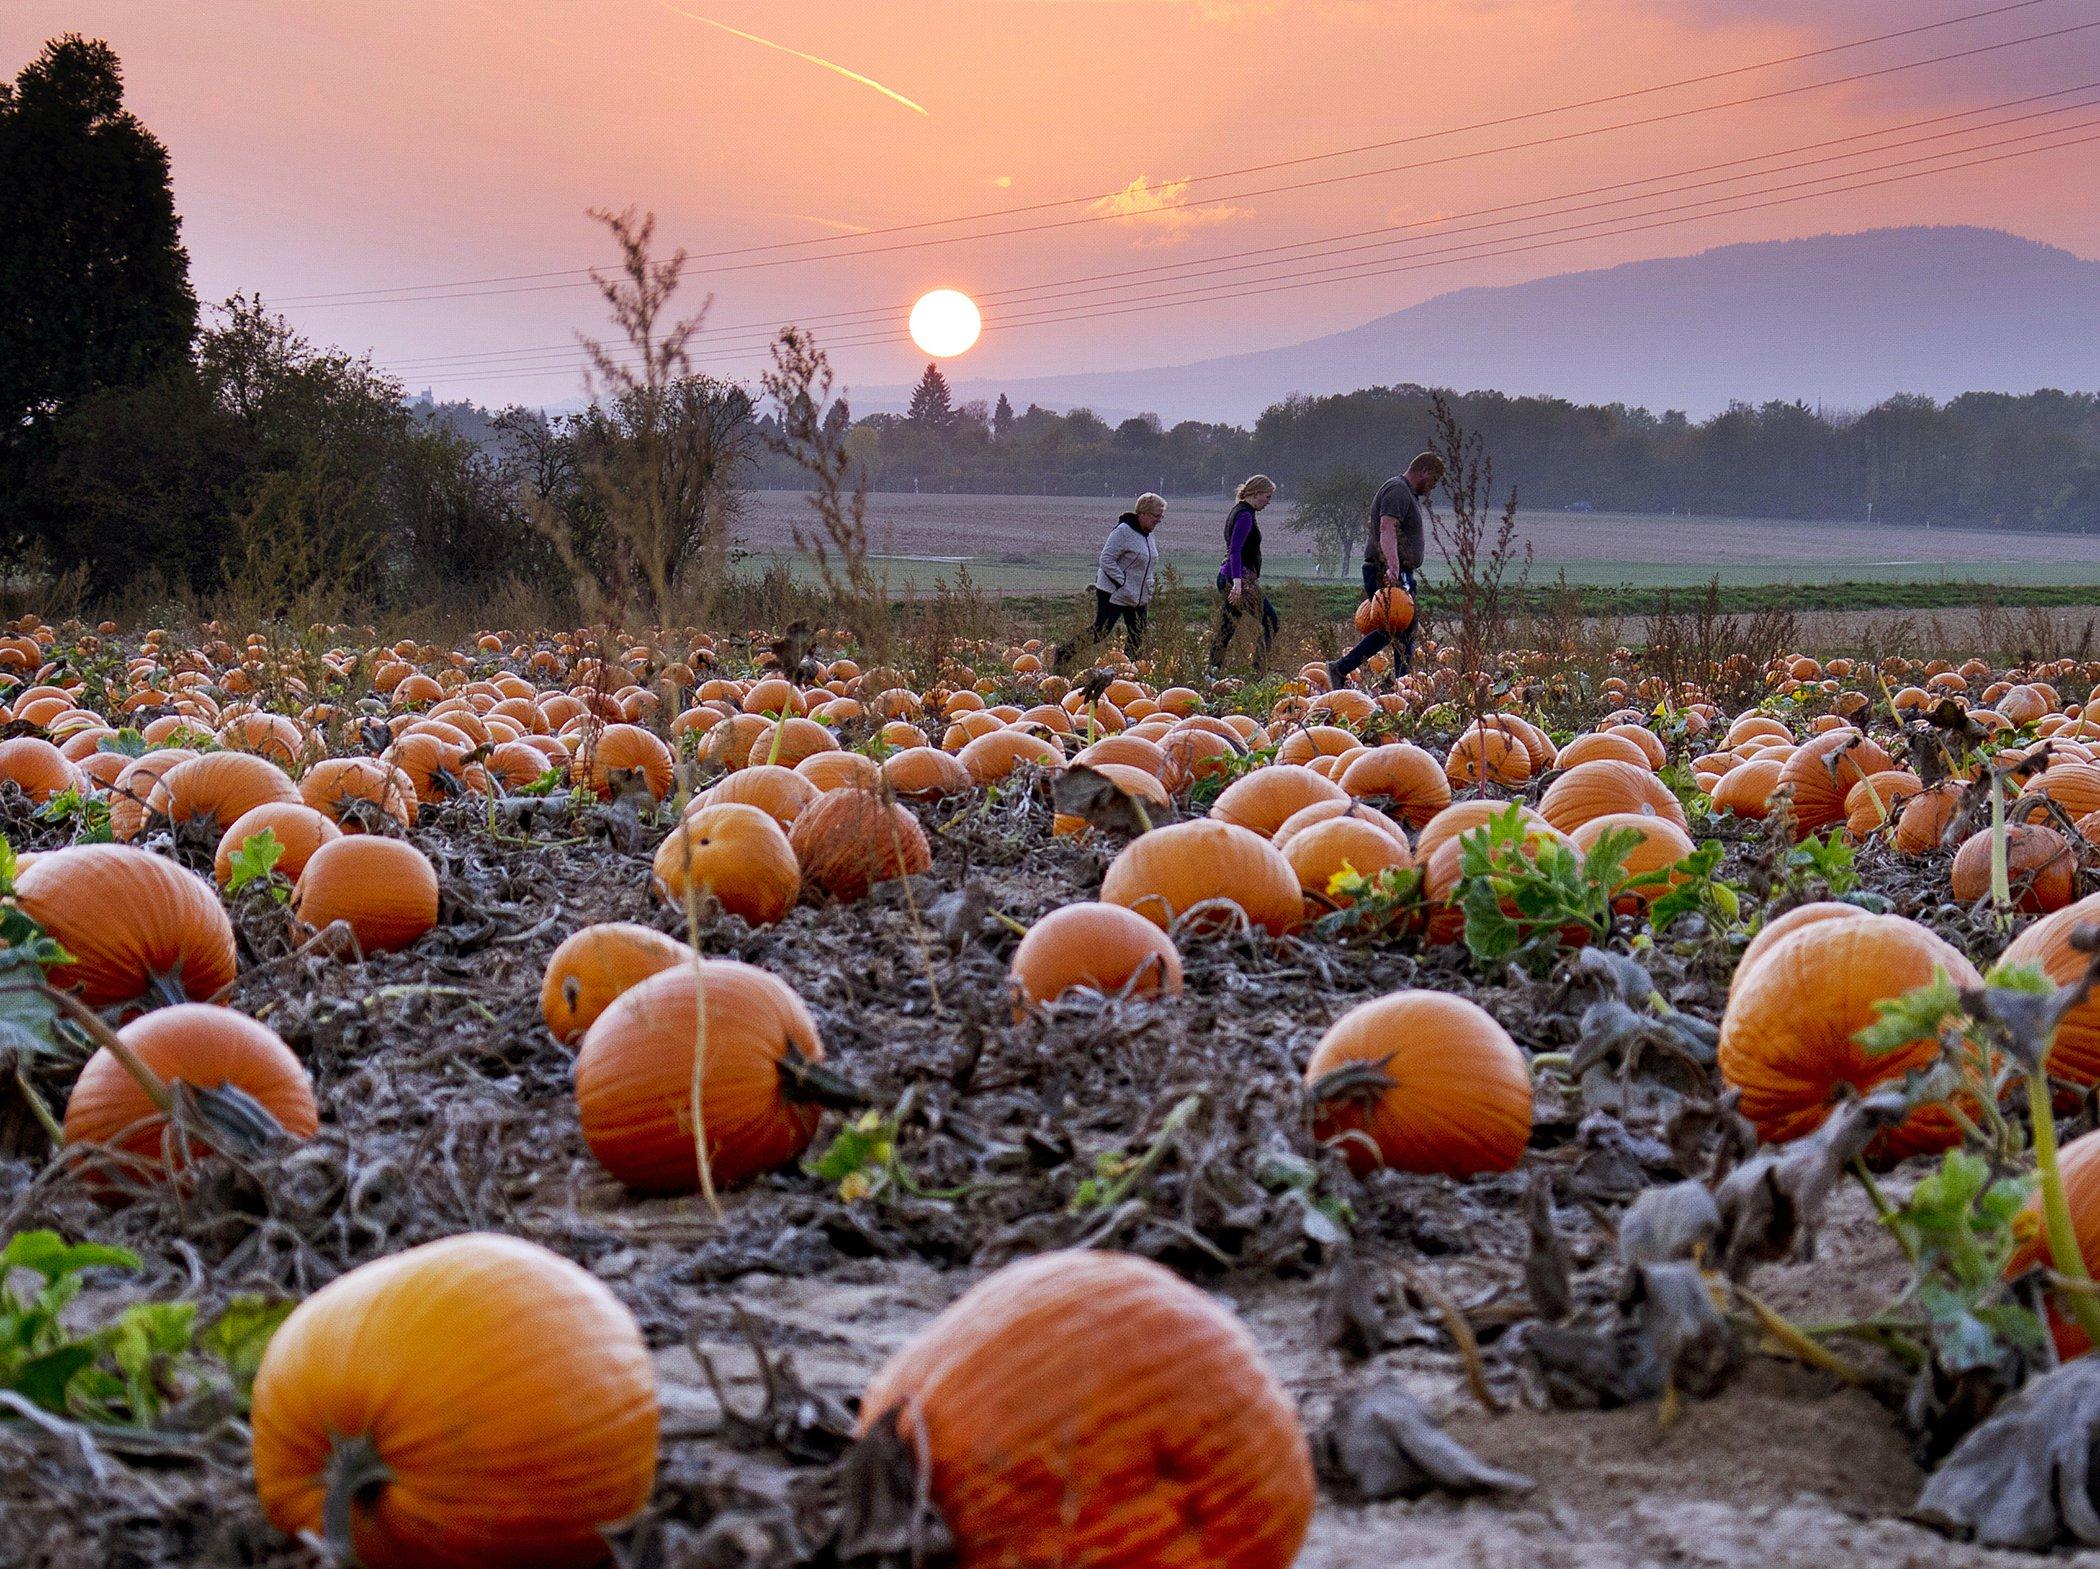 Pumpkin-Patch-Germany-Daily-Life.jpg